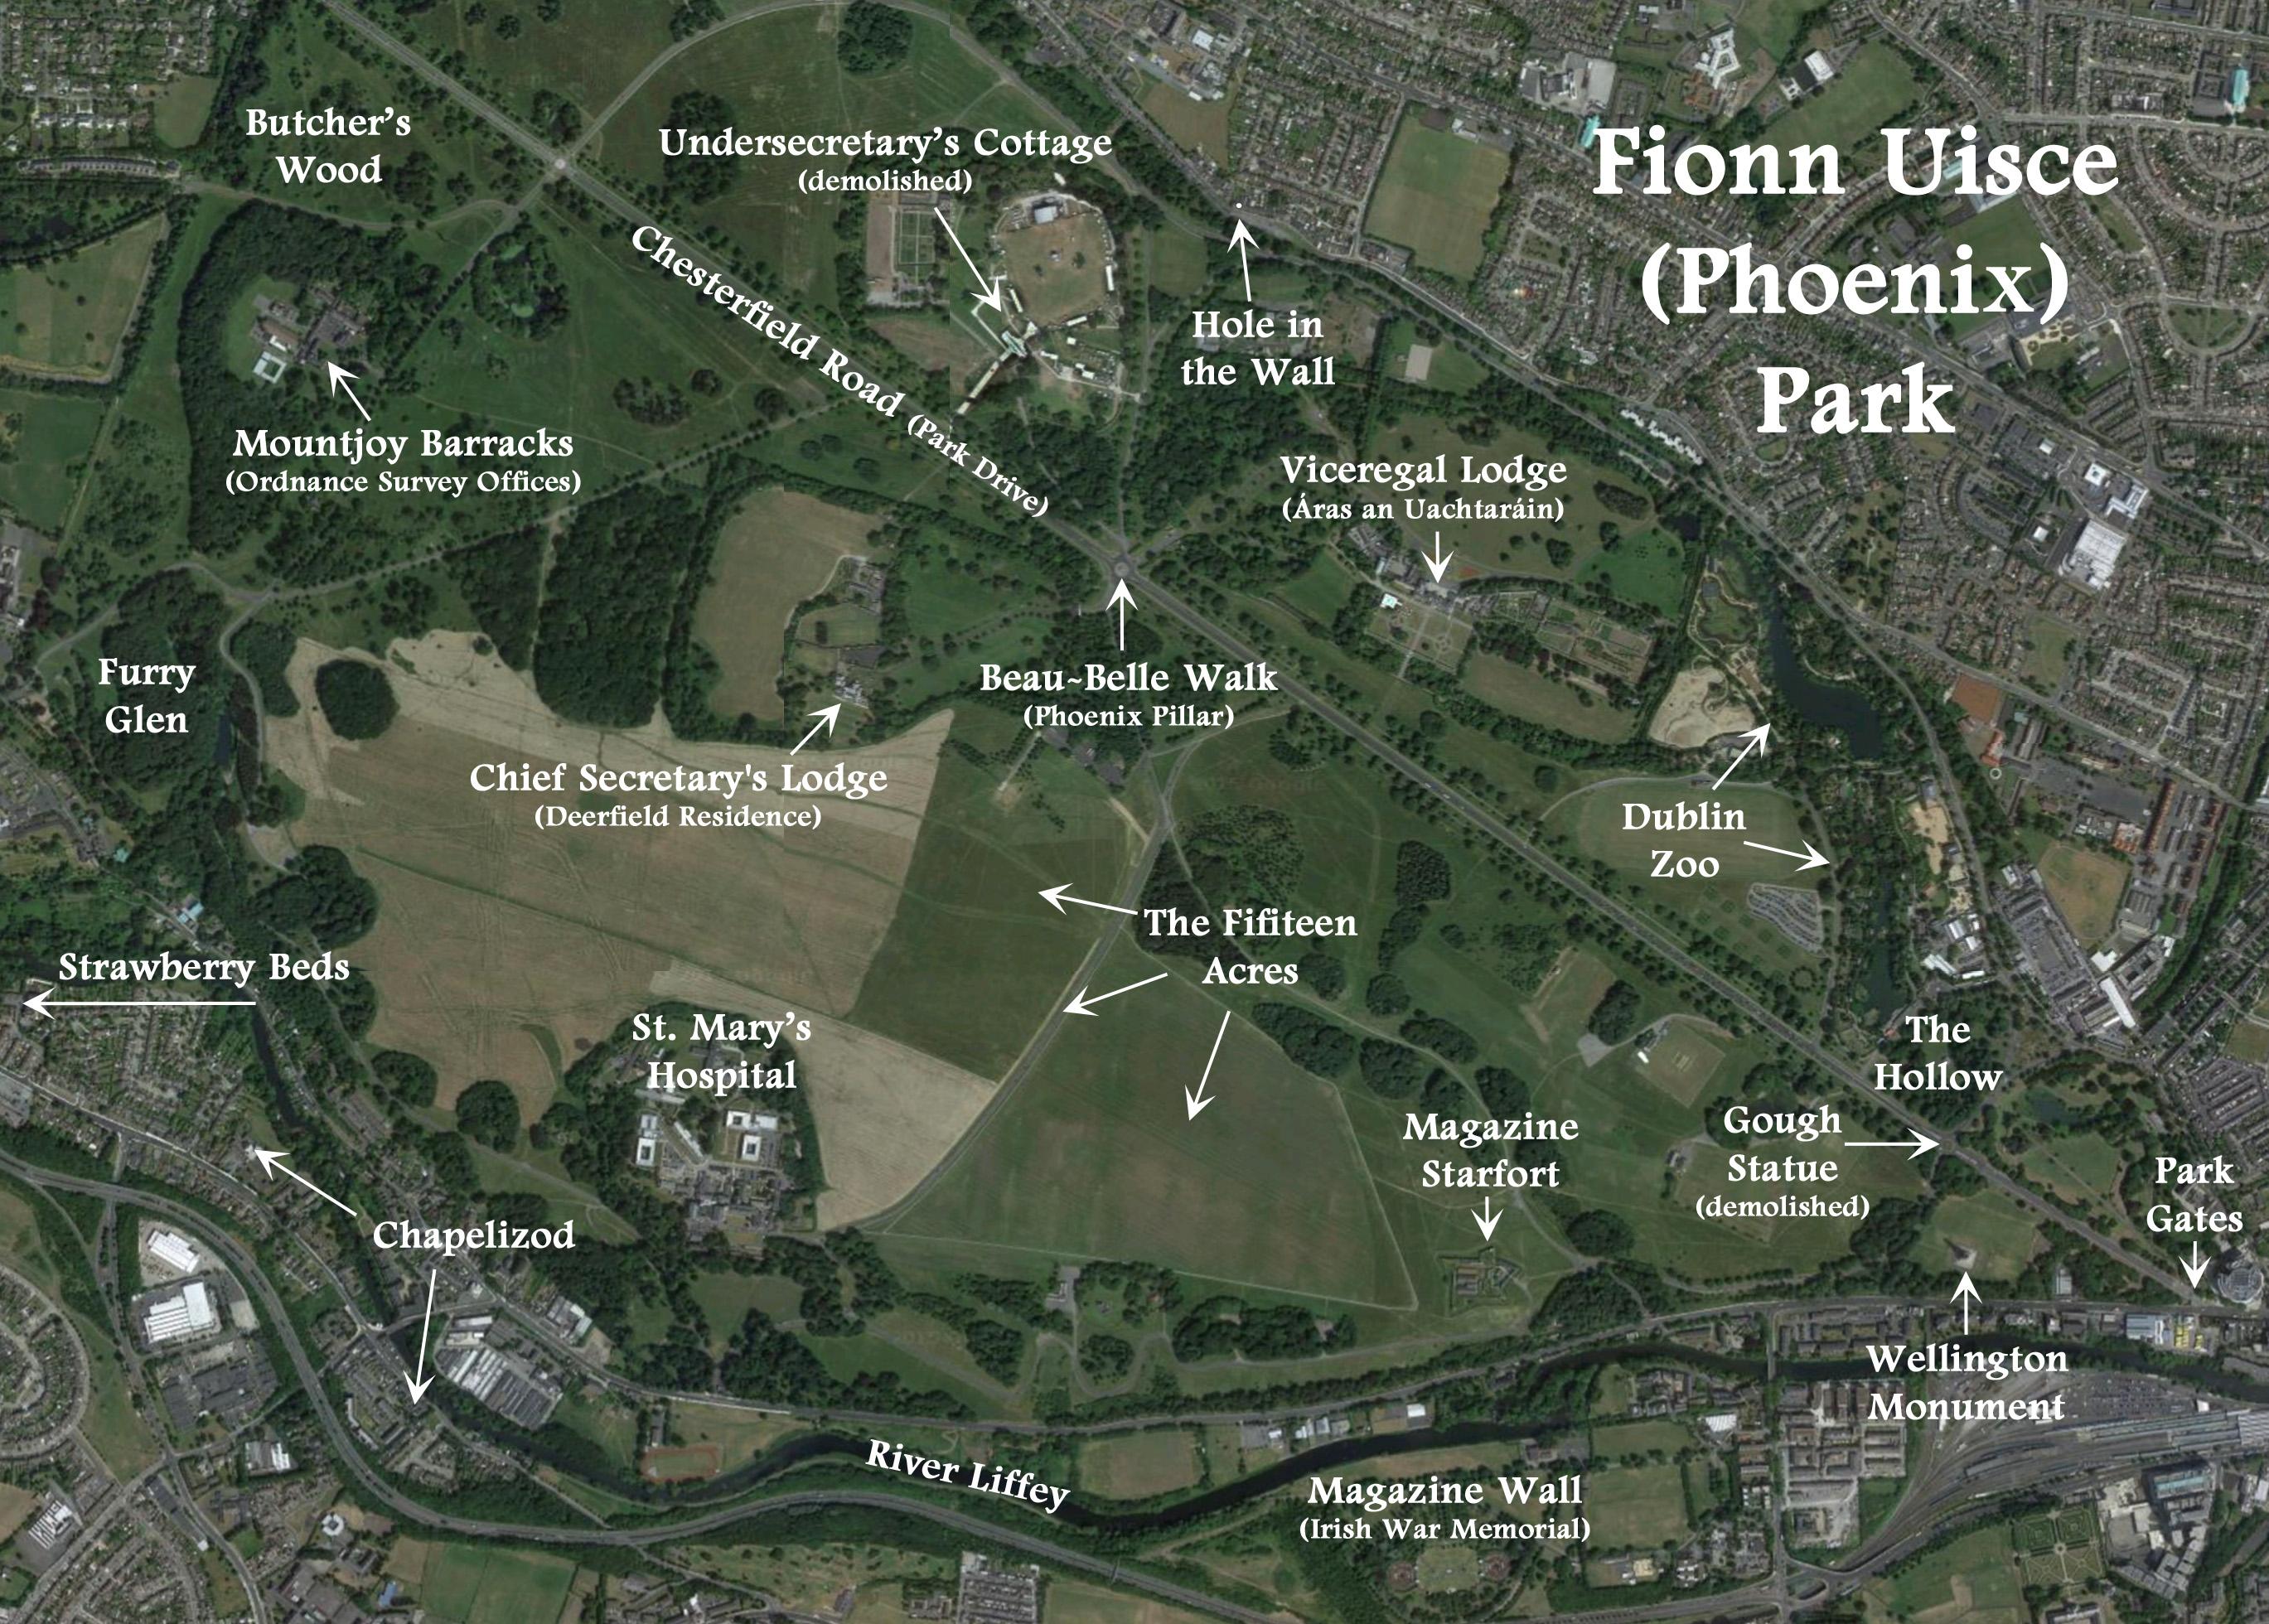 phoenix-park map finnegans wake